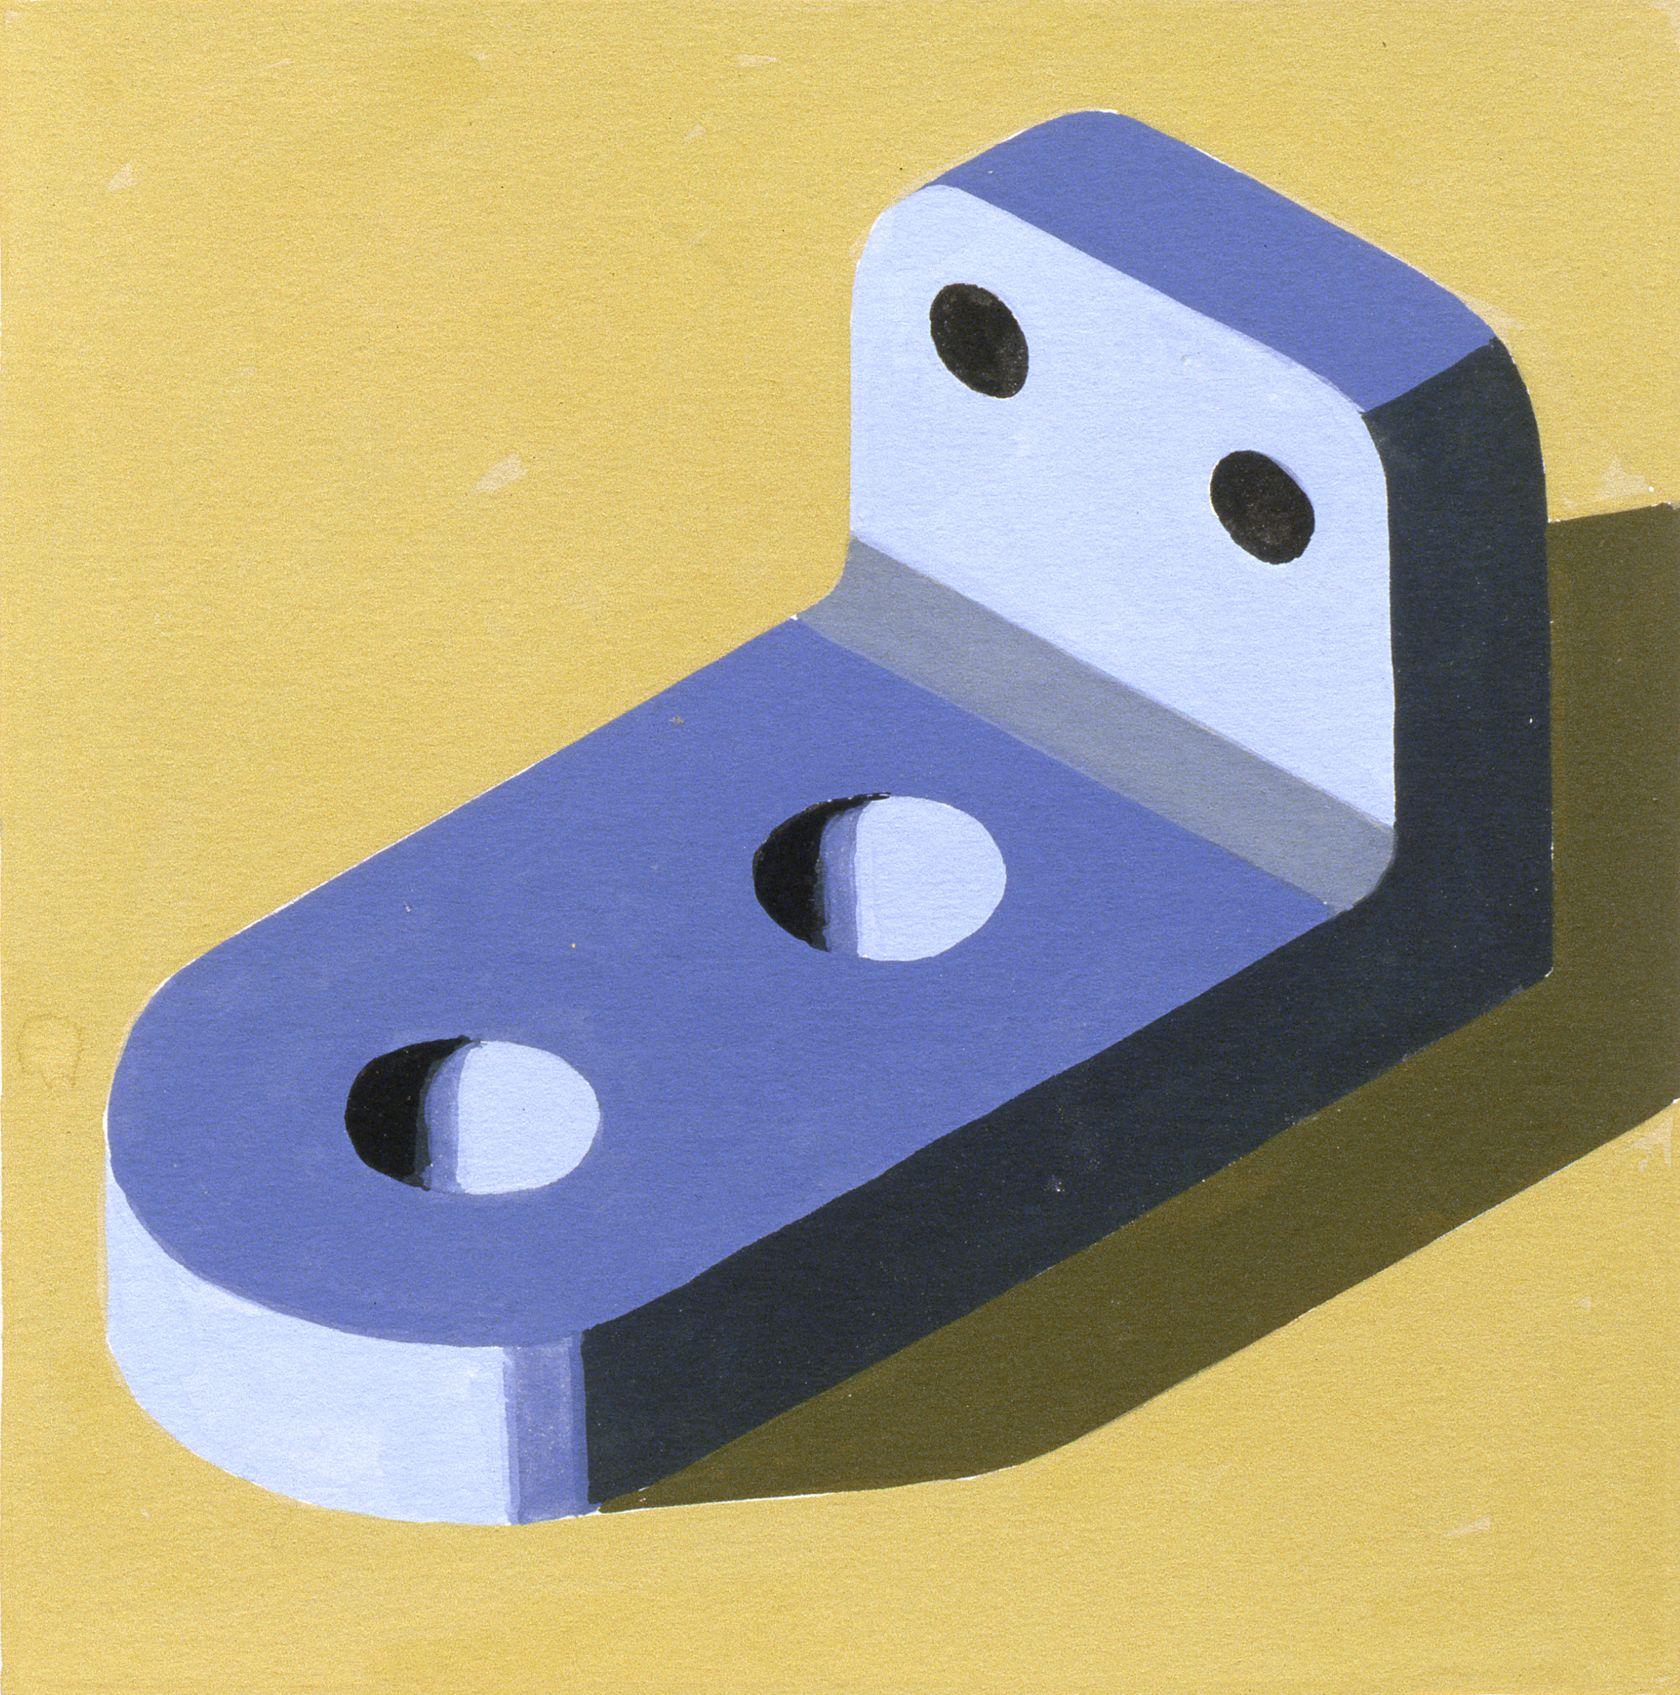 Robert Cottingham, Component XLII, 2005, gouache on paper, 5 1/2 x 5 1/2 inches